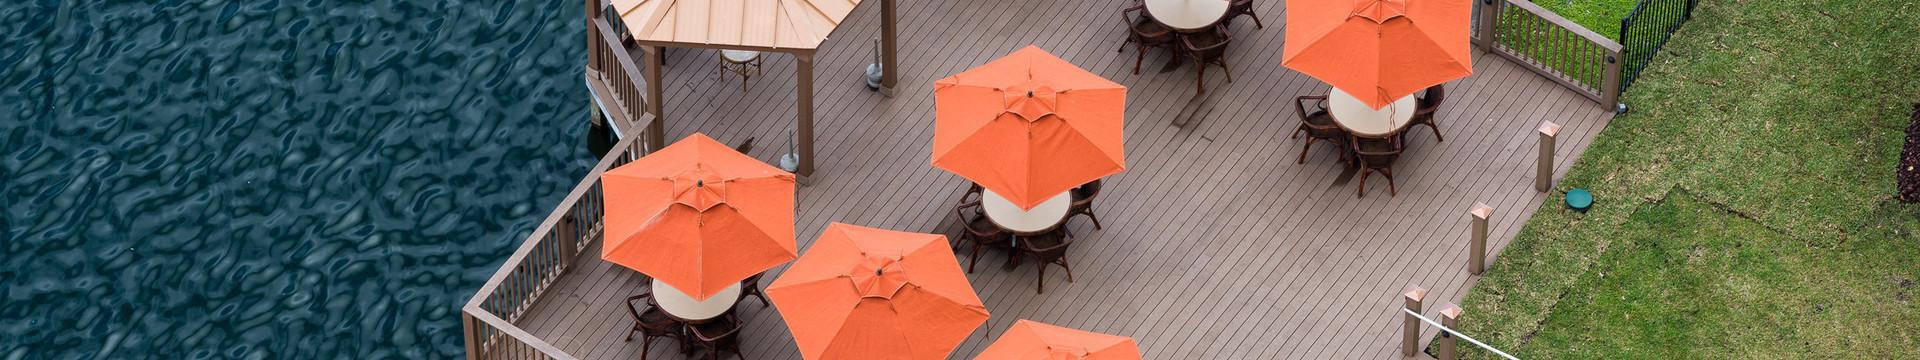 Resort Activities | Westgate Palace in Orlando Florida